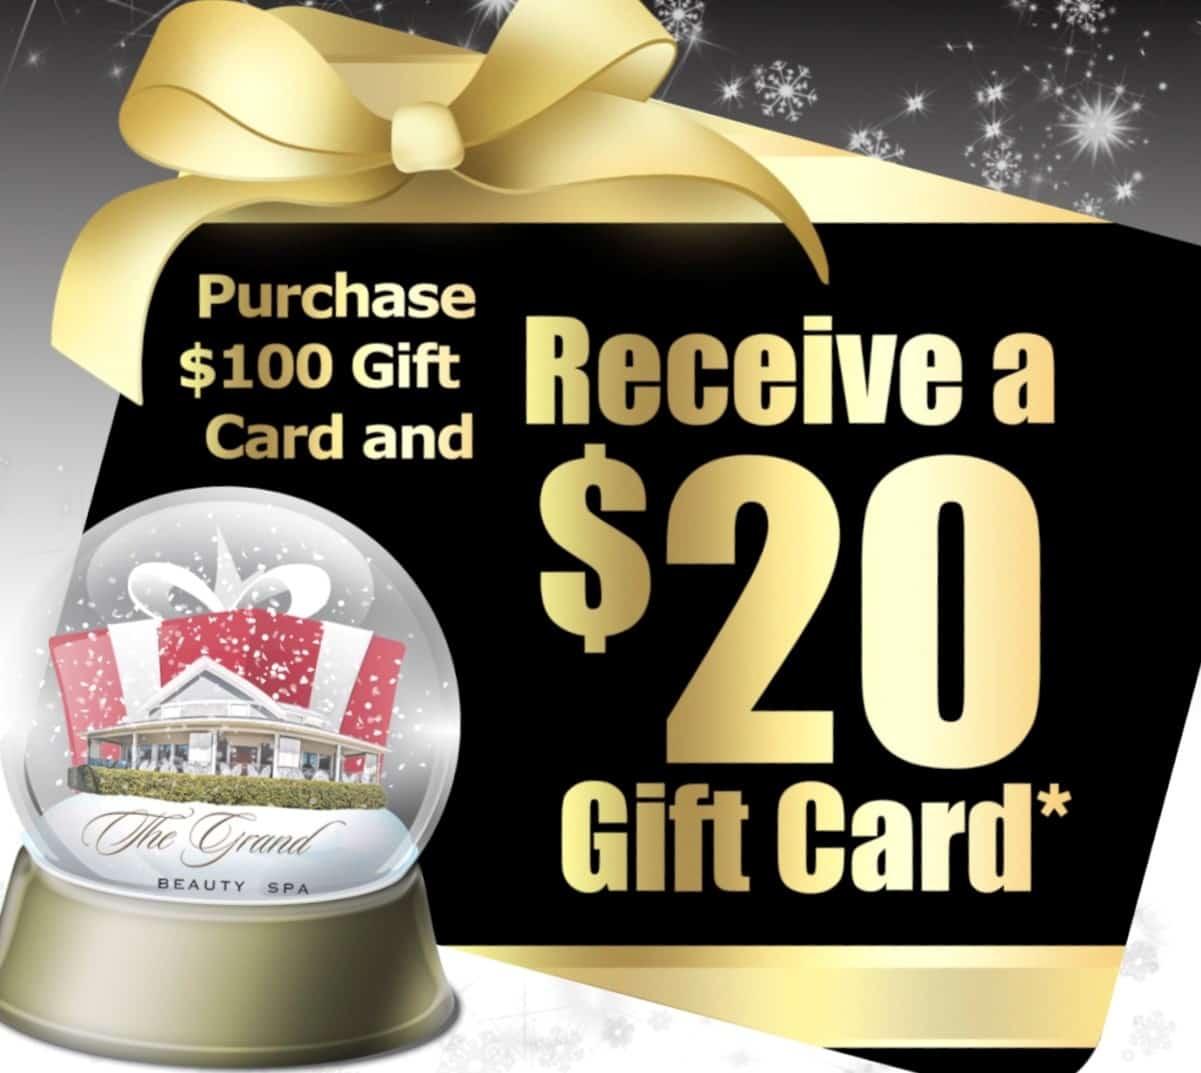 Black Friday Gift Card | Grand Beauty Spa